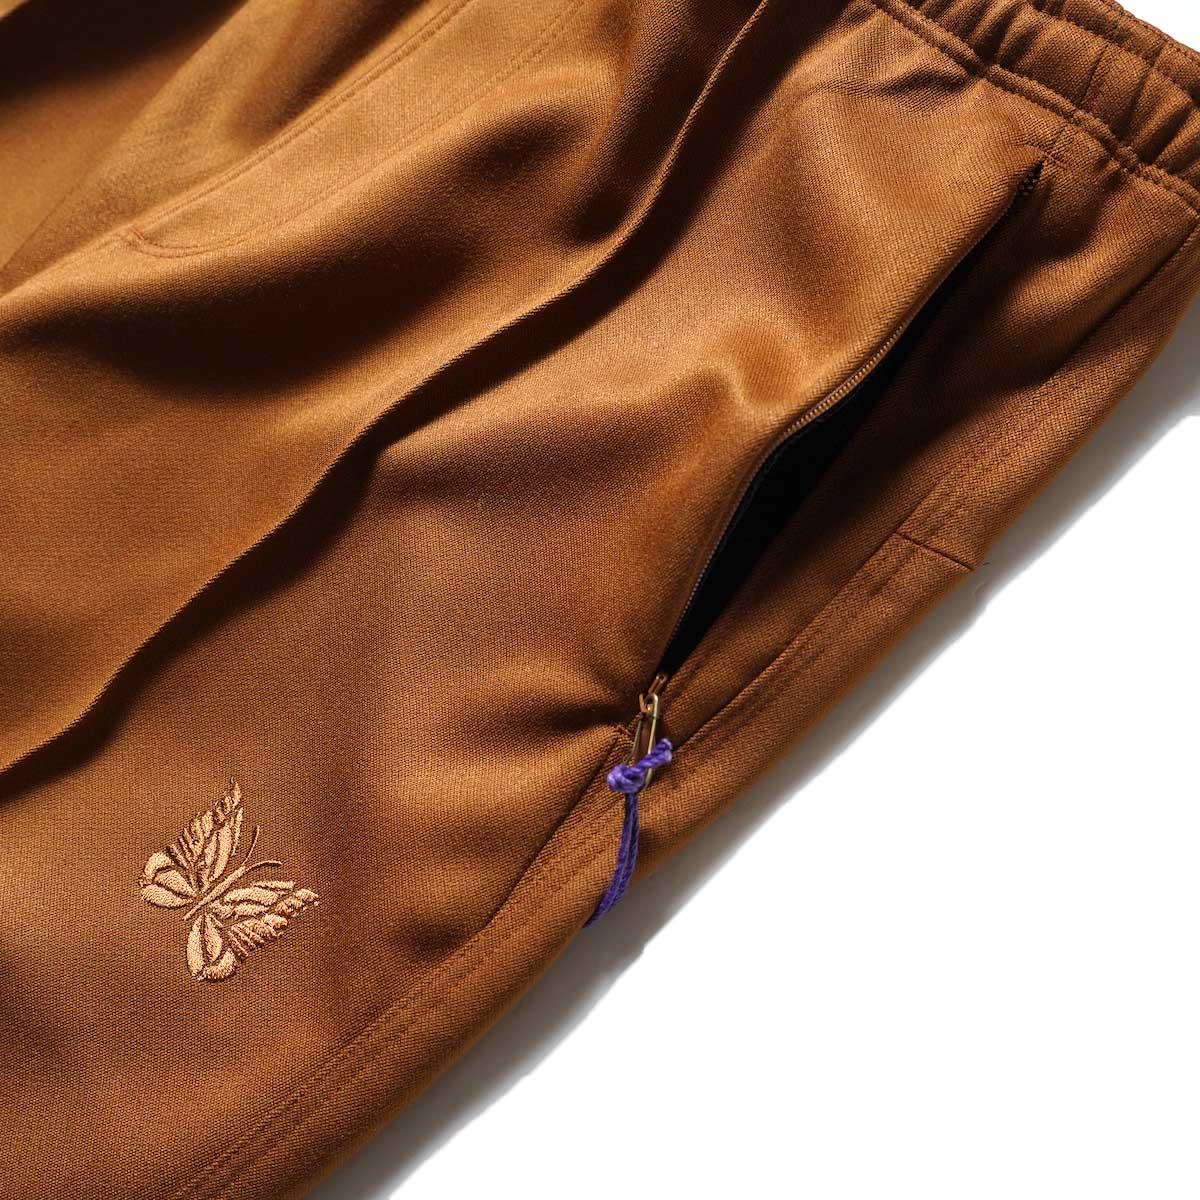 Needles / W.U. BOOT-CUT PANT - PE/R DOESKIN (Brown)サイドポケット